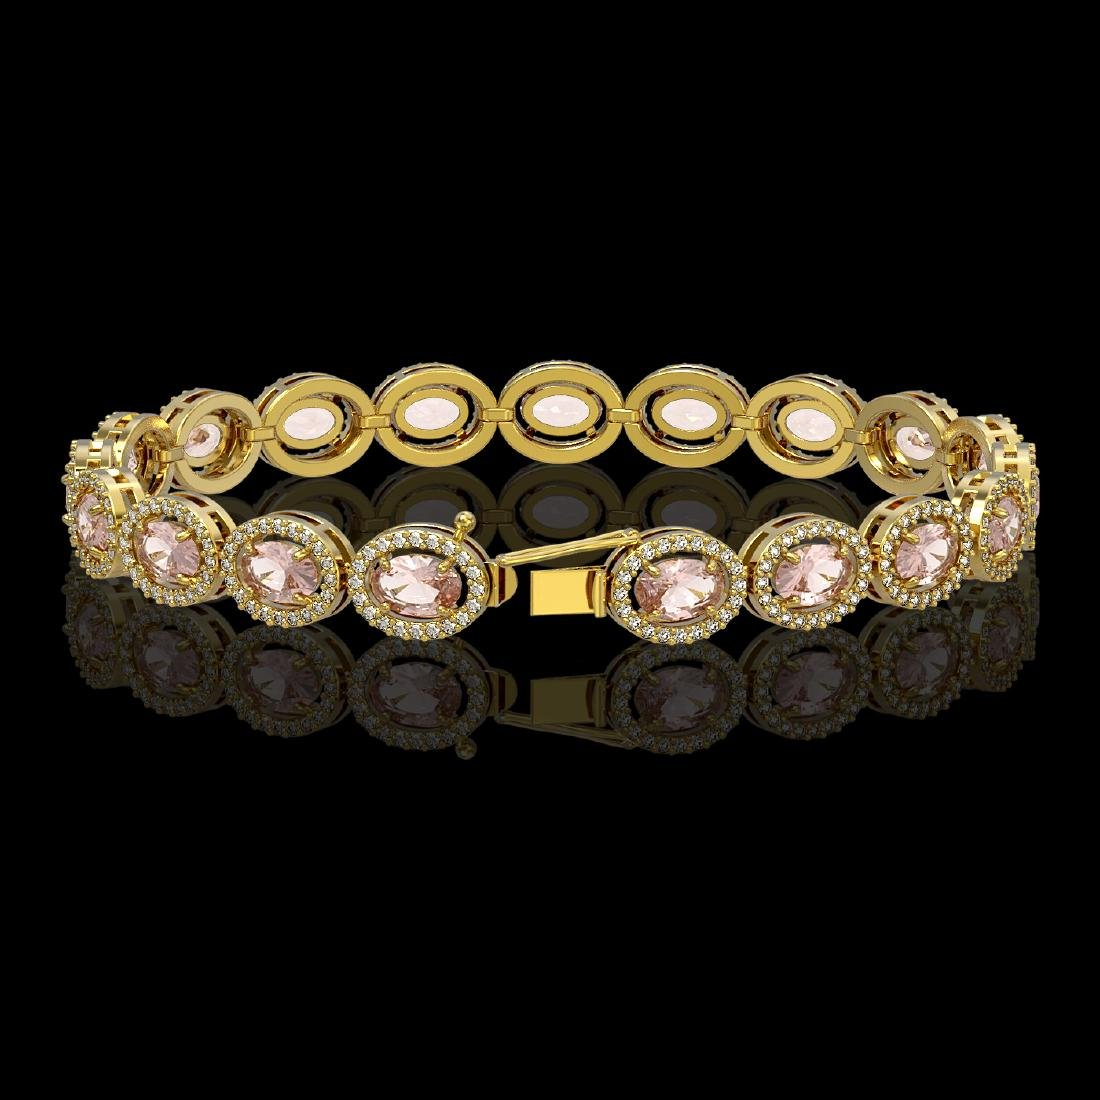 14.25 CTW Morganite & Diamond Halo Bracelet 10K Yellow - 2